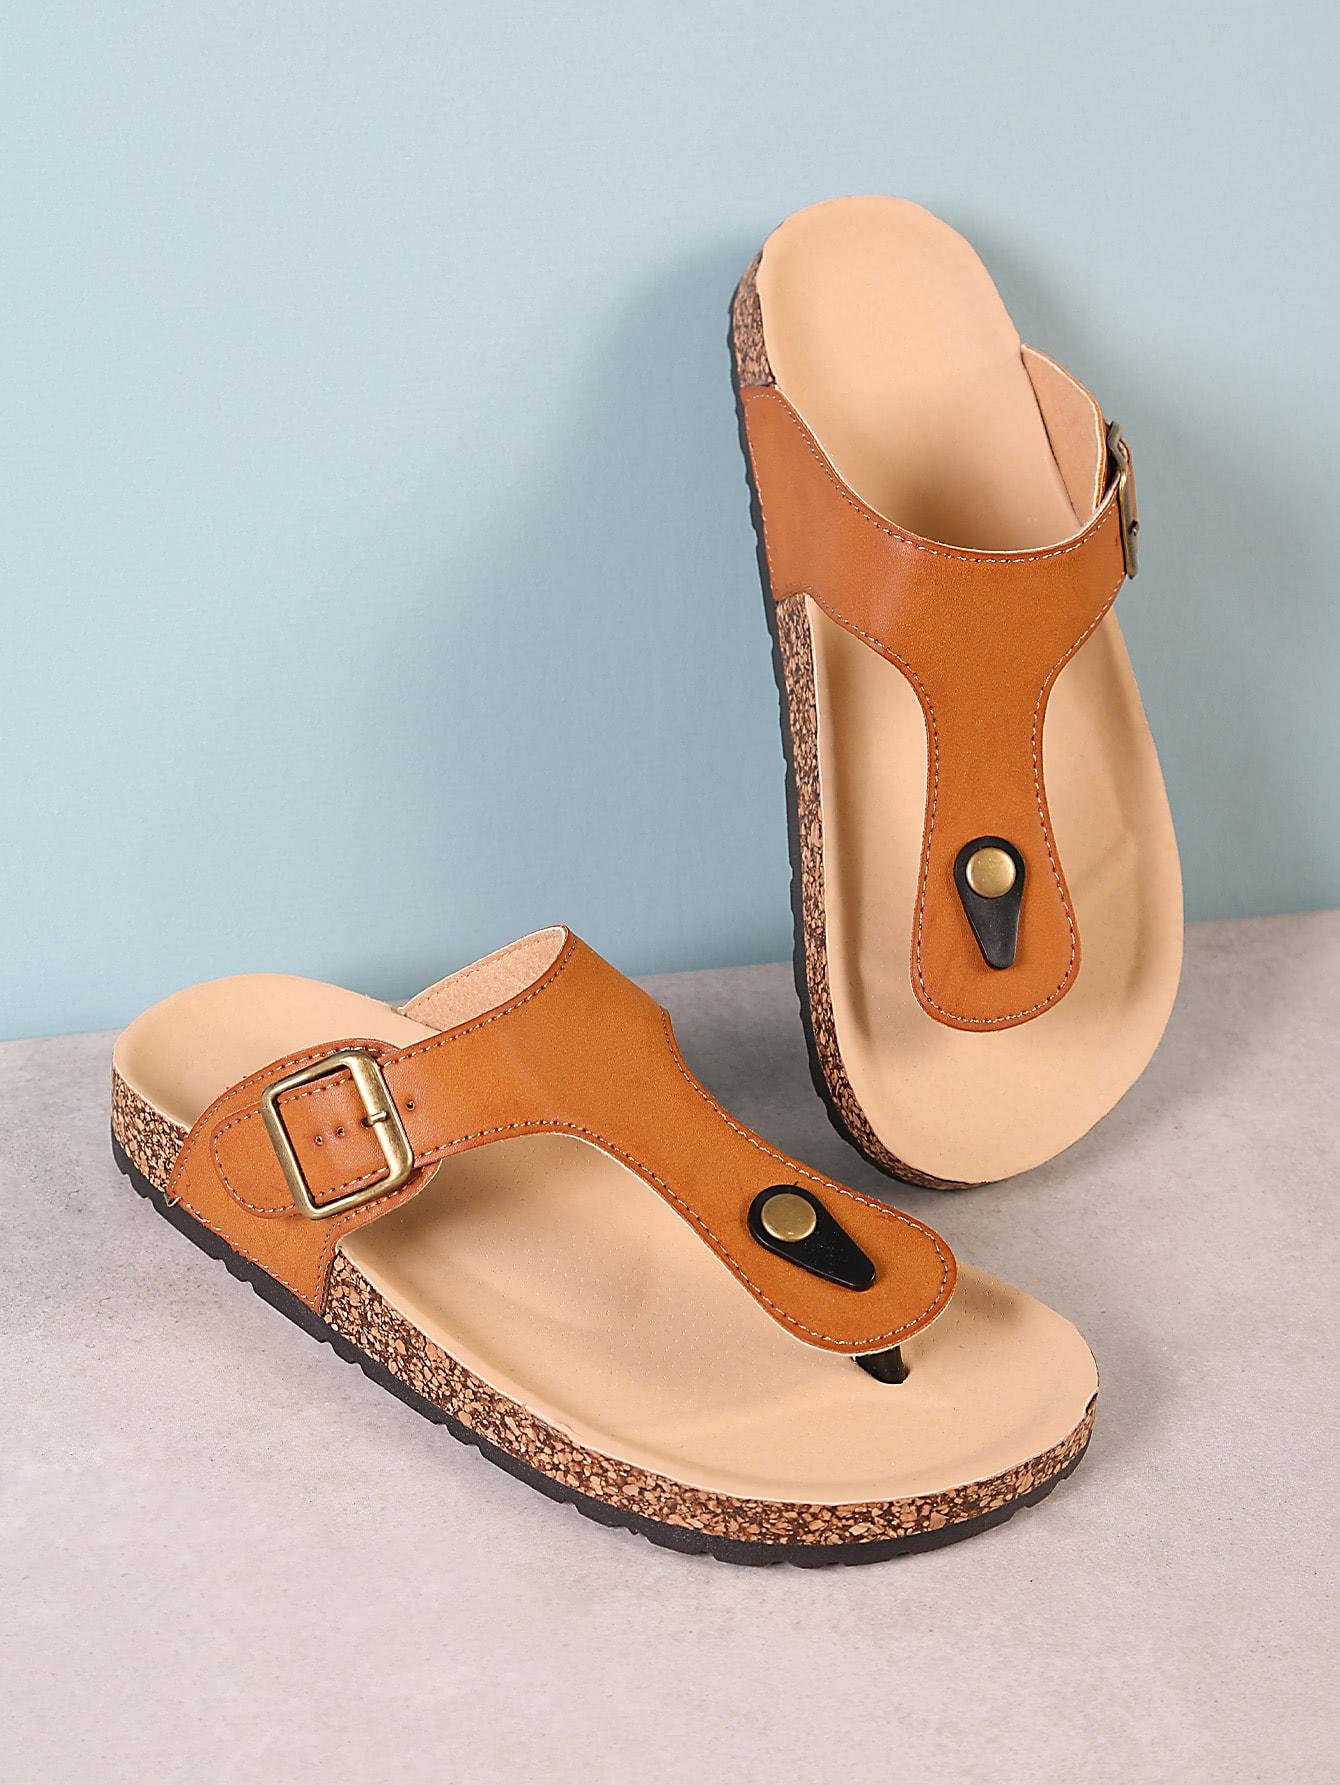 Cork Footbed Slide Sandal with Buckled T-Strap Thong TAN шлепанцы женские soludos knotted slide sandal ivory